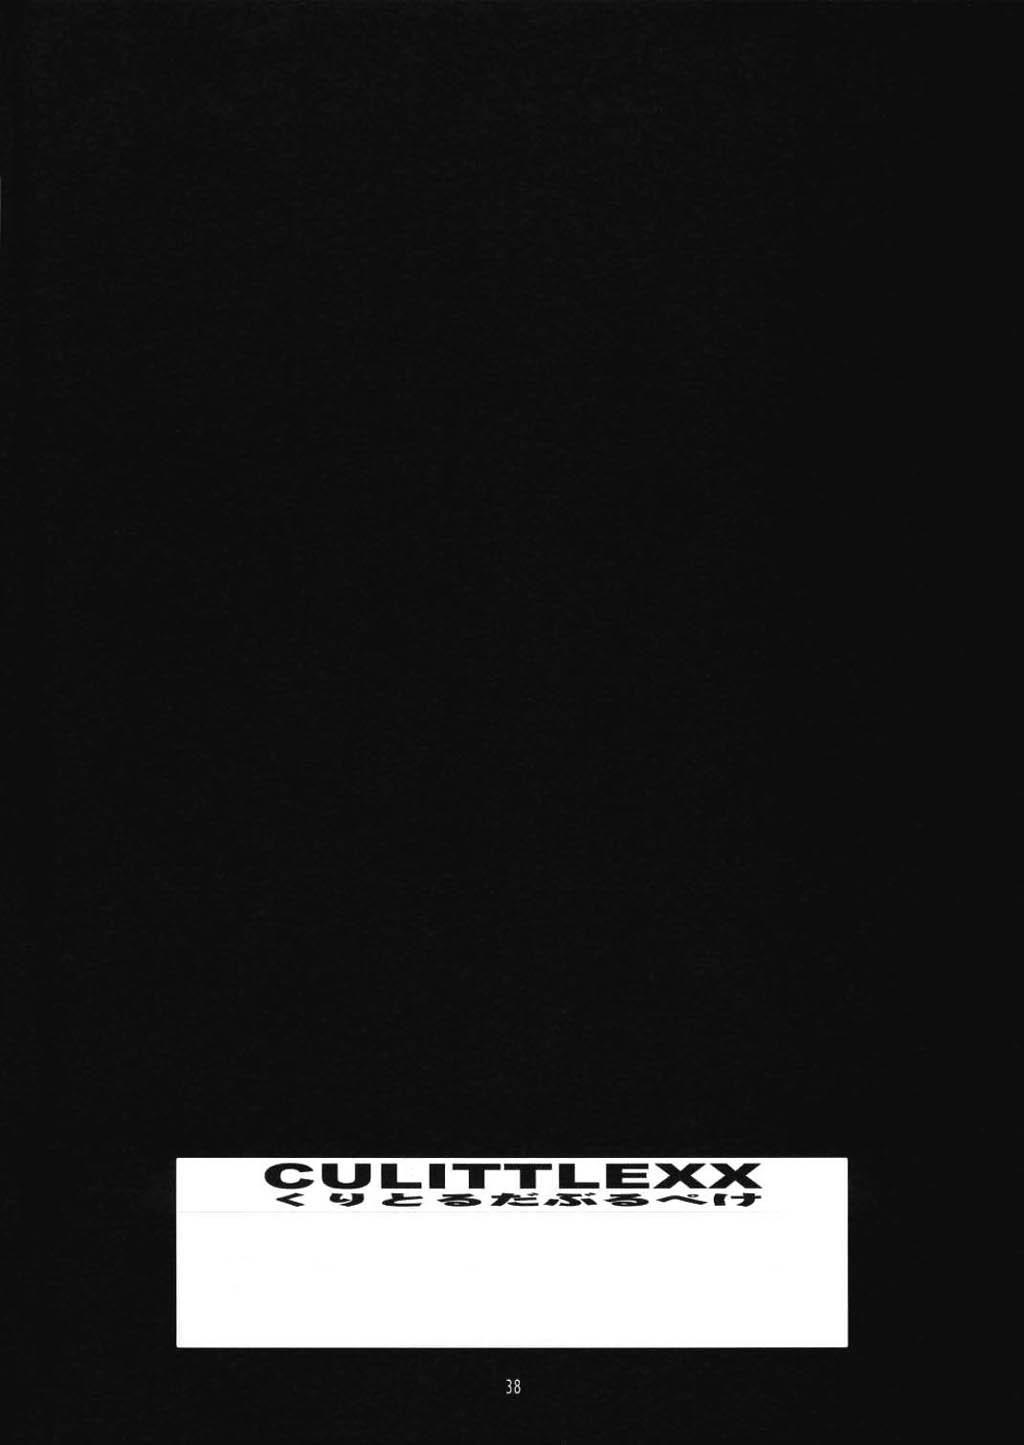 Culittle XX 37